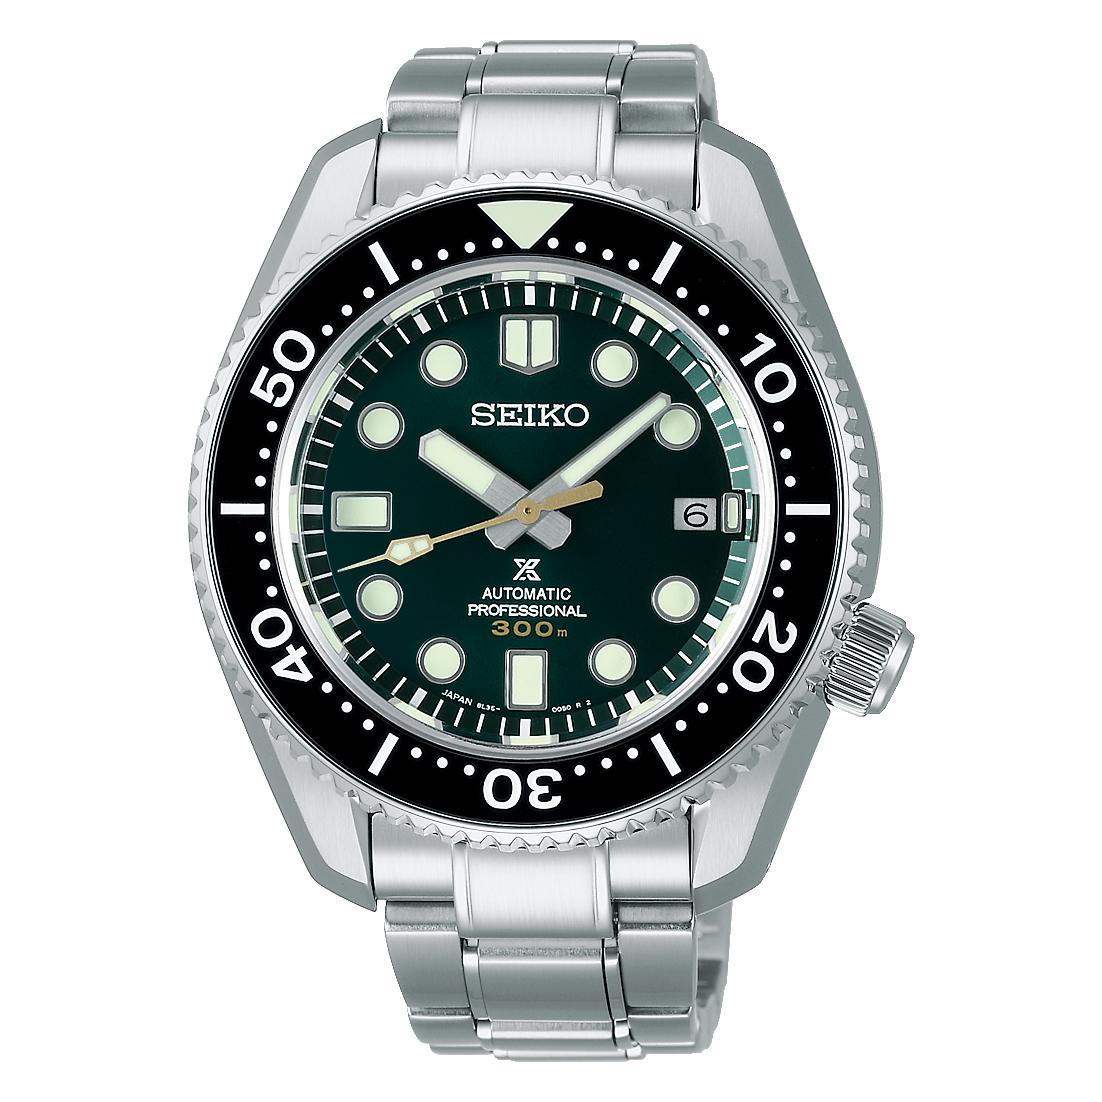 Seiko Prospex SLA047 / SLA047J1 The Seiko 140th Anniversary Limited Edition